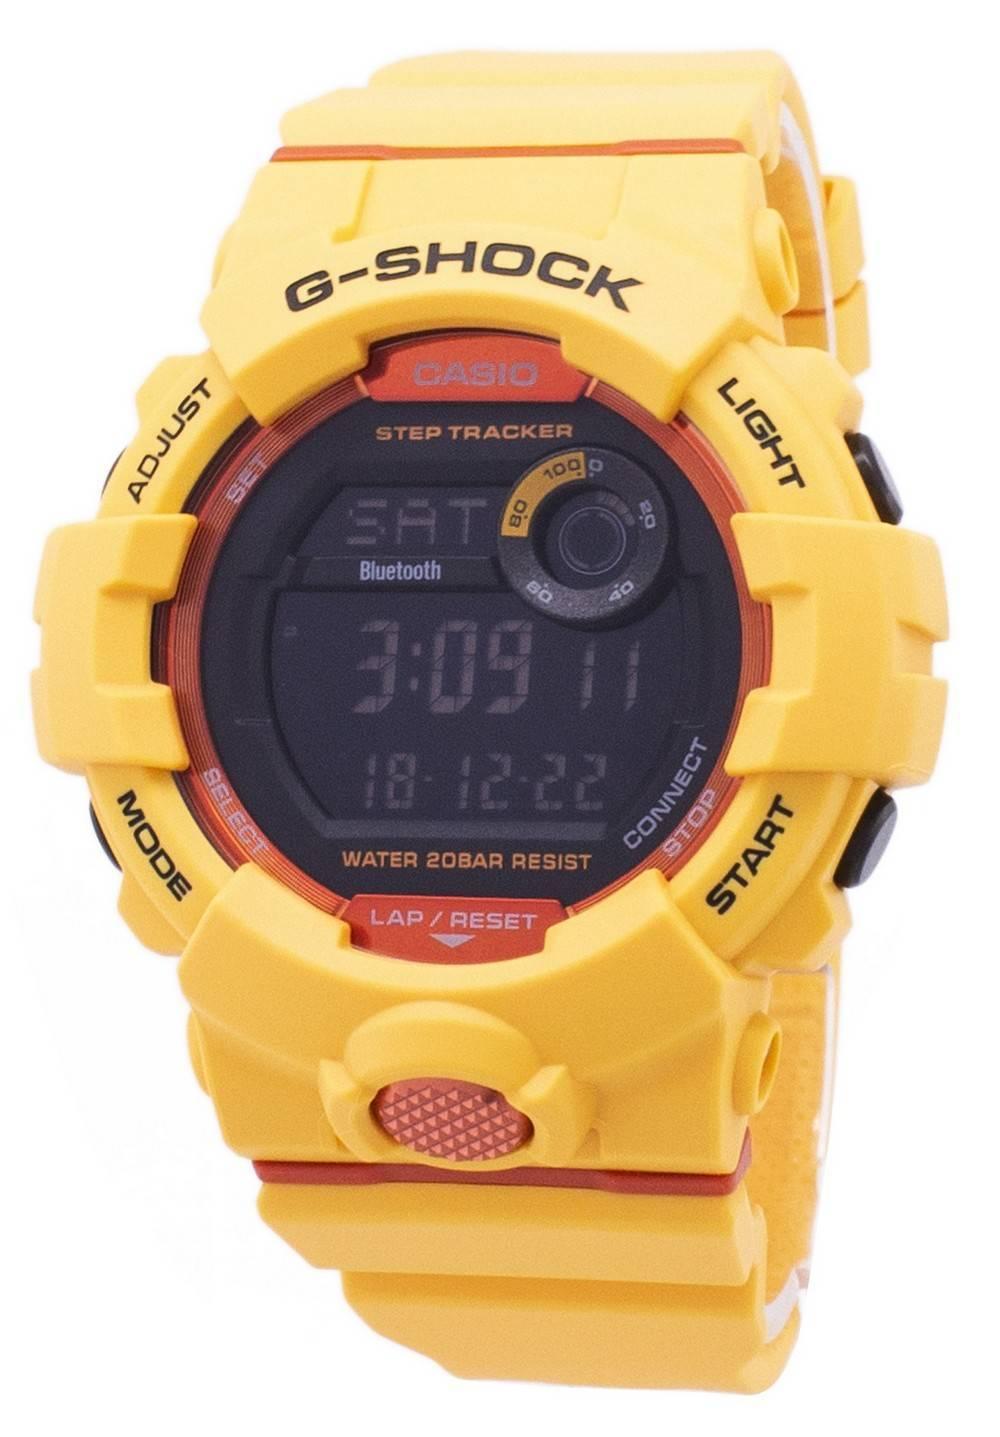 bc54388d2 Detalles acerca de Casio G-shock GBD-800-4 Bluetooth de cuarzo Reloj para  hombres 200M- mostrar título original